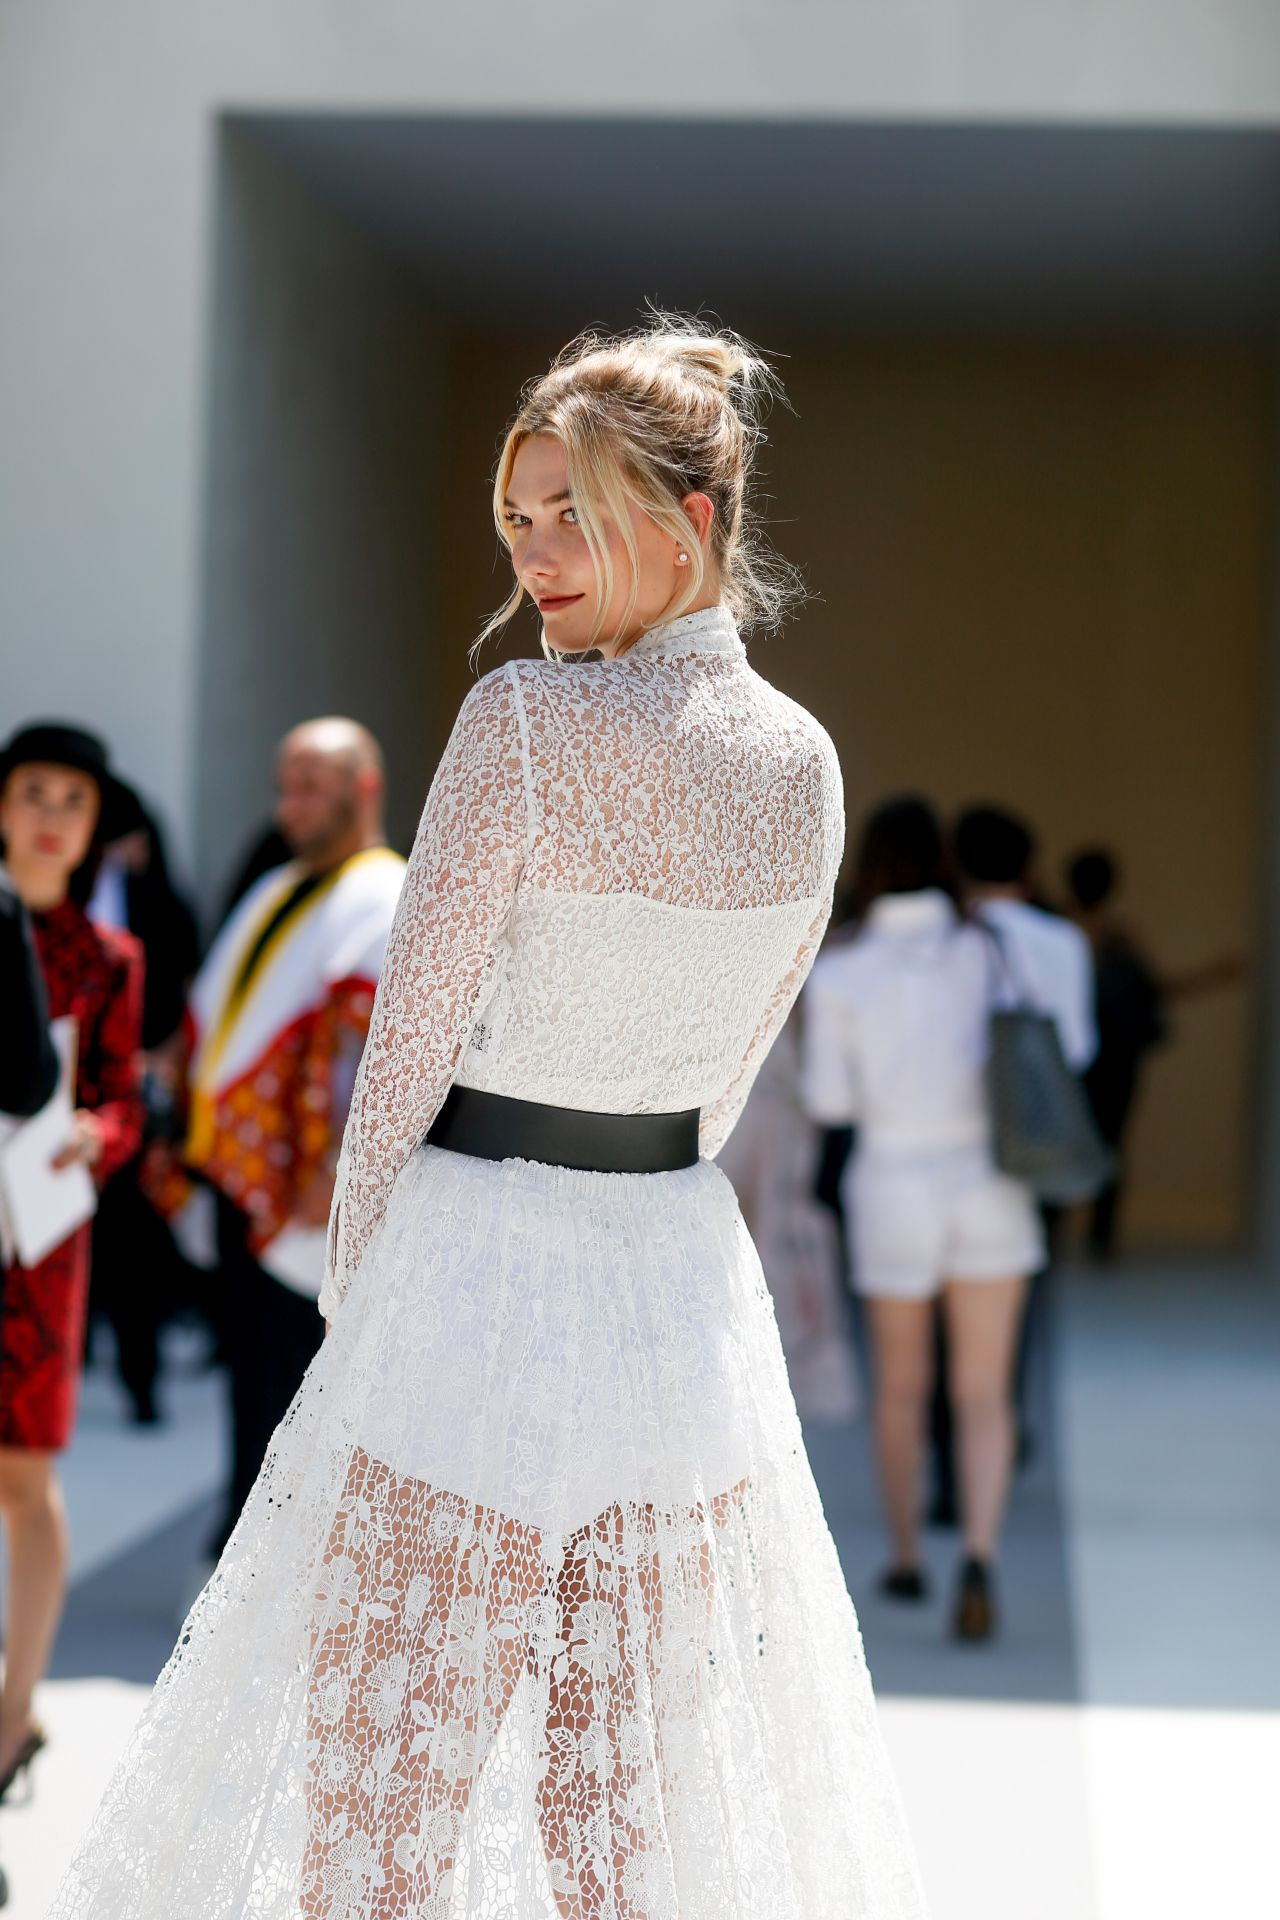 Karlie Kloss Outside The Christian Dior Show Fall Winter